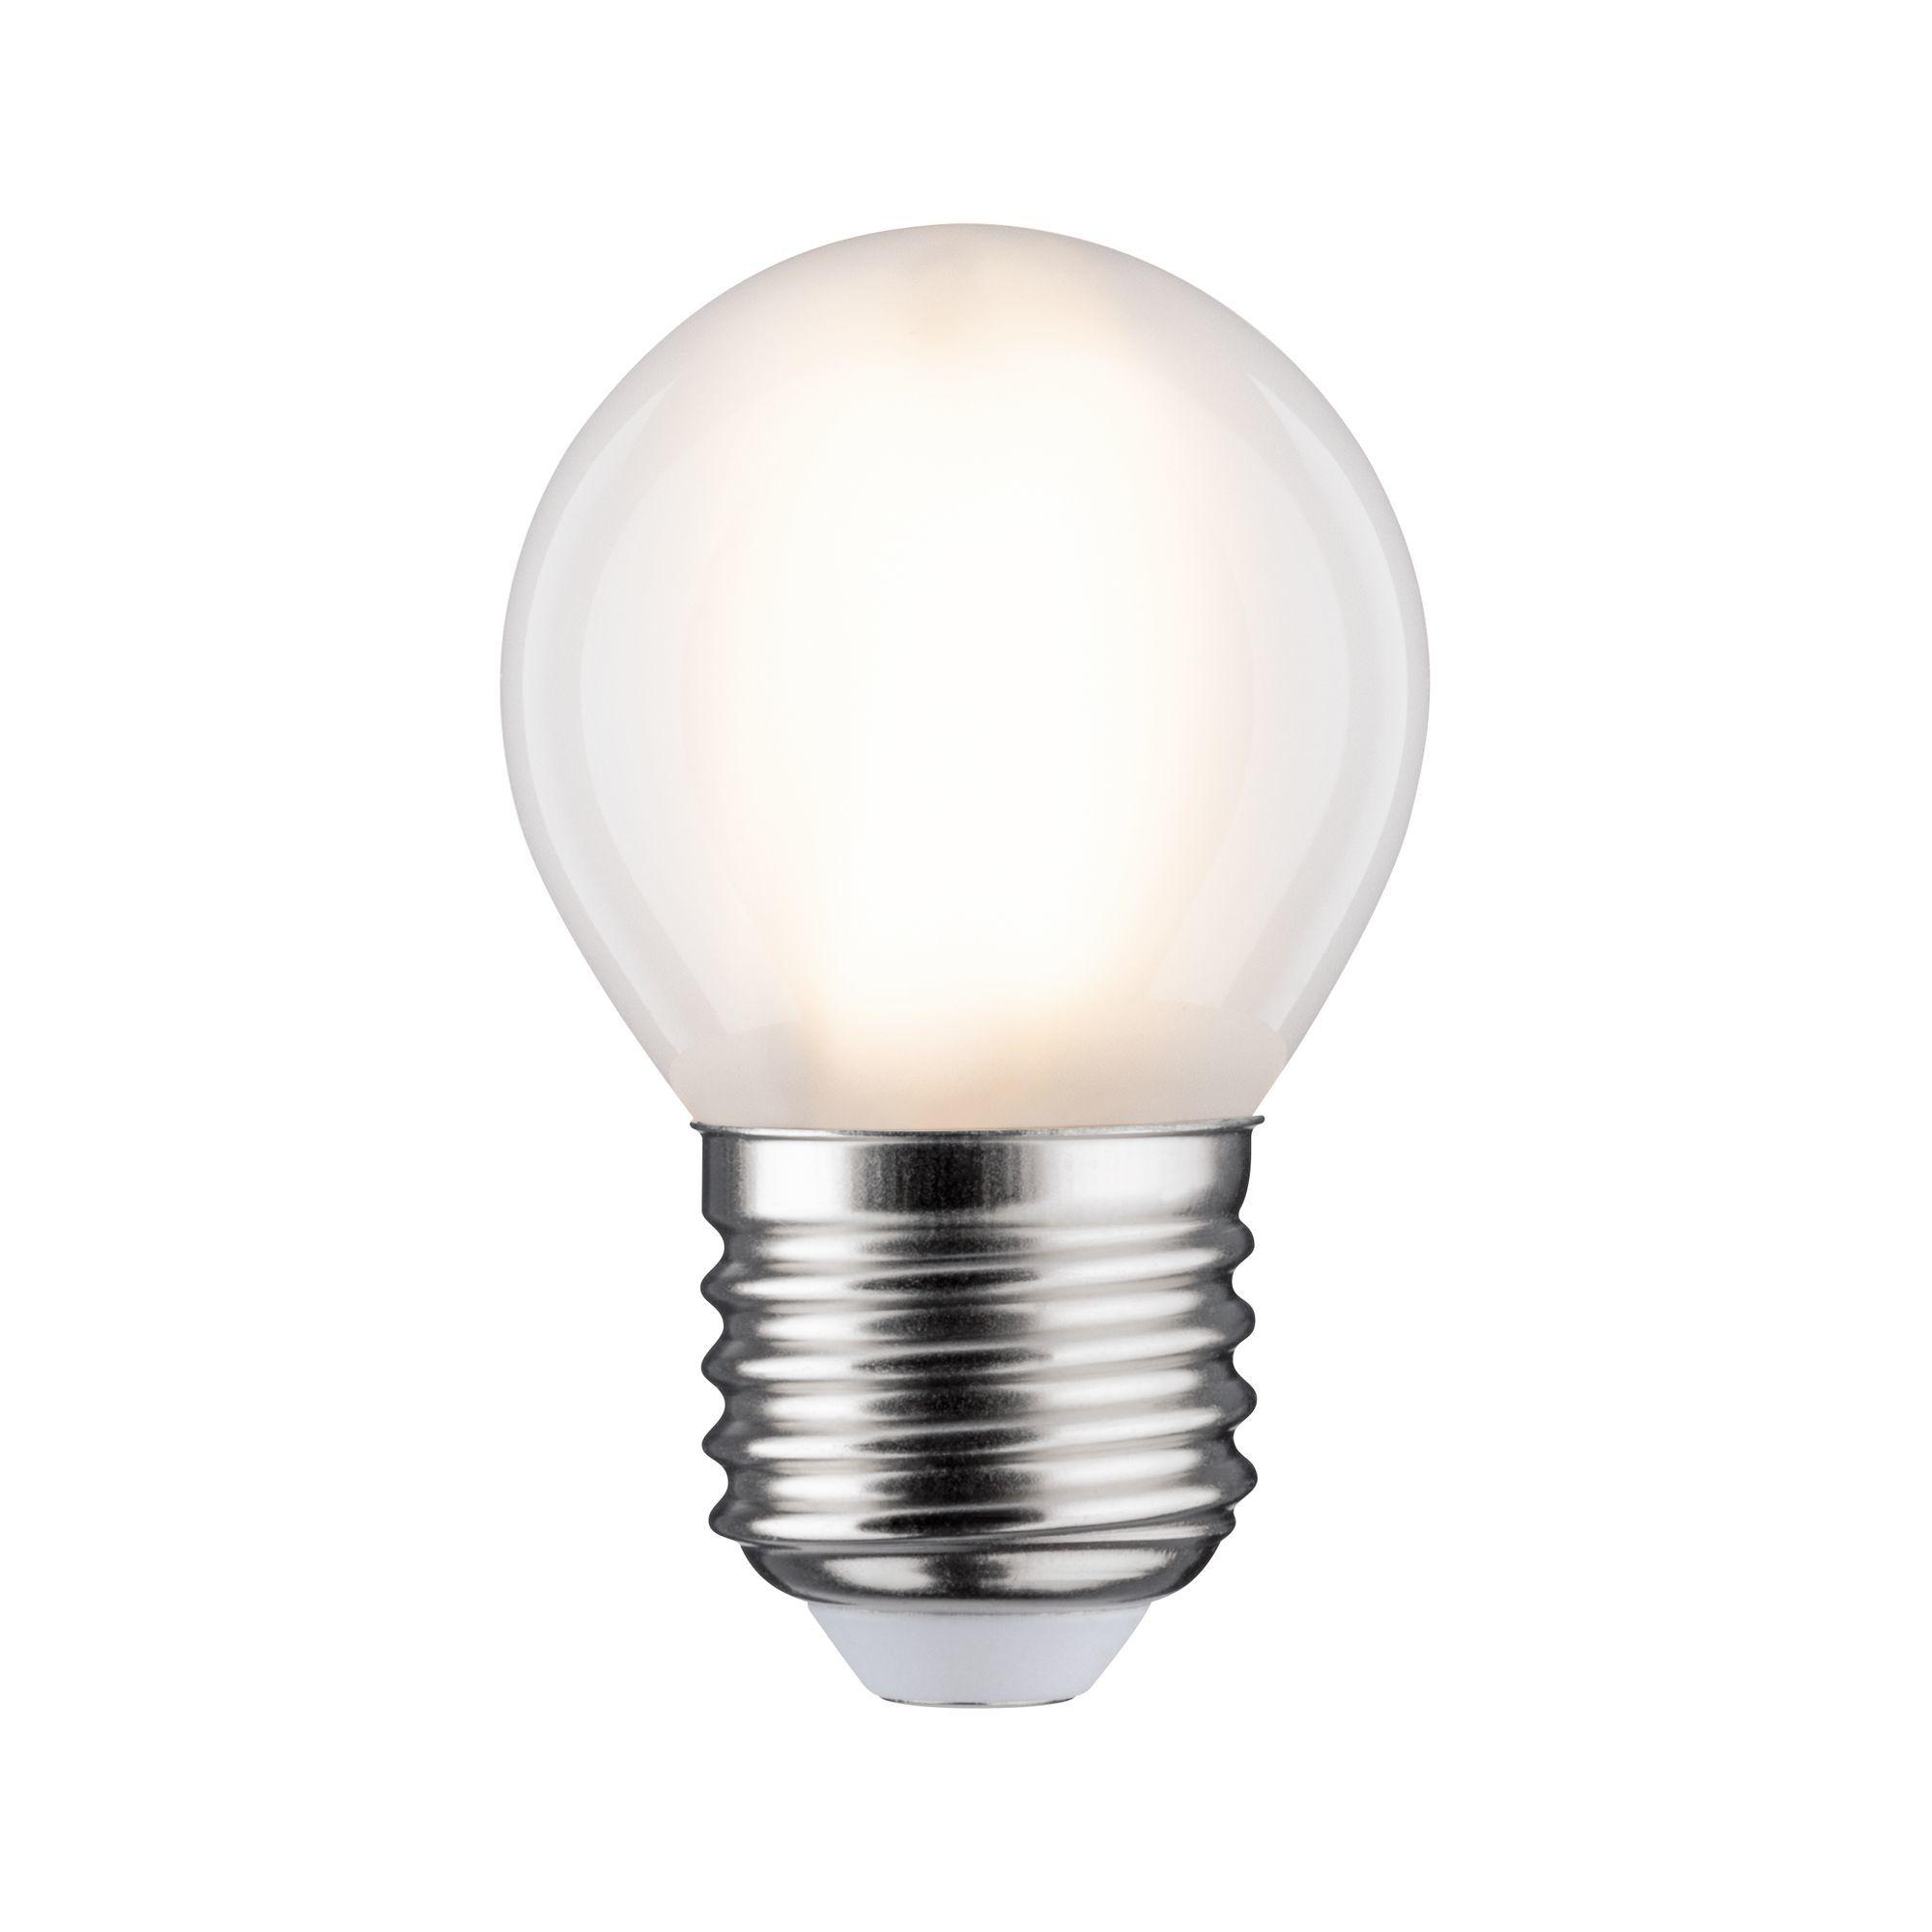 Paulmann LED Fil Tropfen 470lm E27 2700K matt 5W 230V (28634)